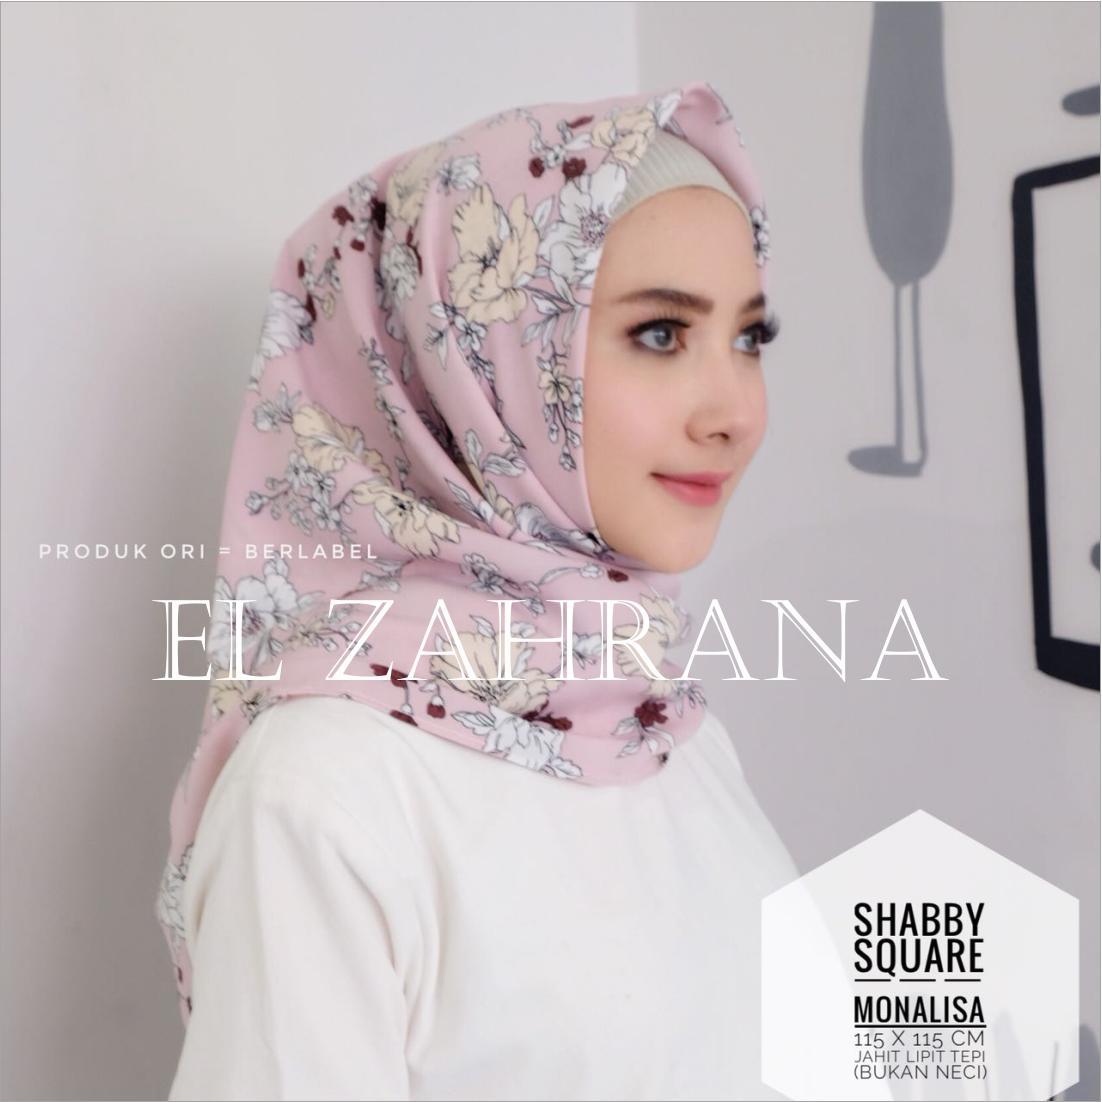 El Zahrana Hijab -  Kerudung Segi Empat - Jilbab Segi Empat - Hijab Segi Empat - Jilbab Motif Premium Monalisa Square - Maxmara Lux